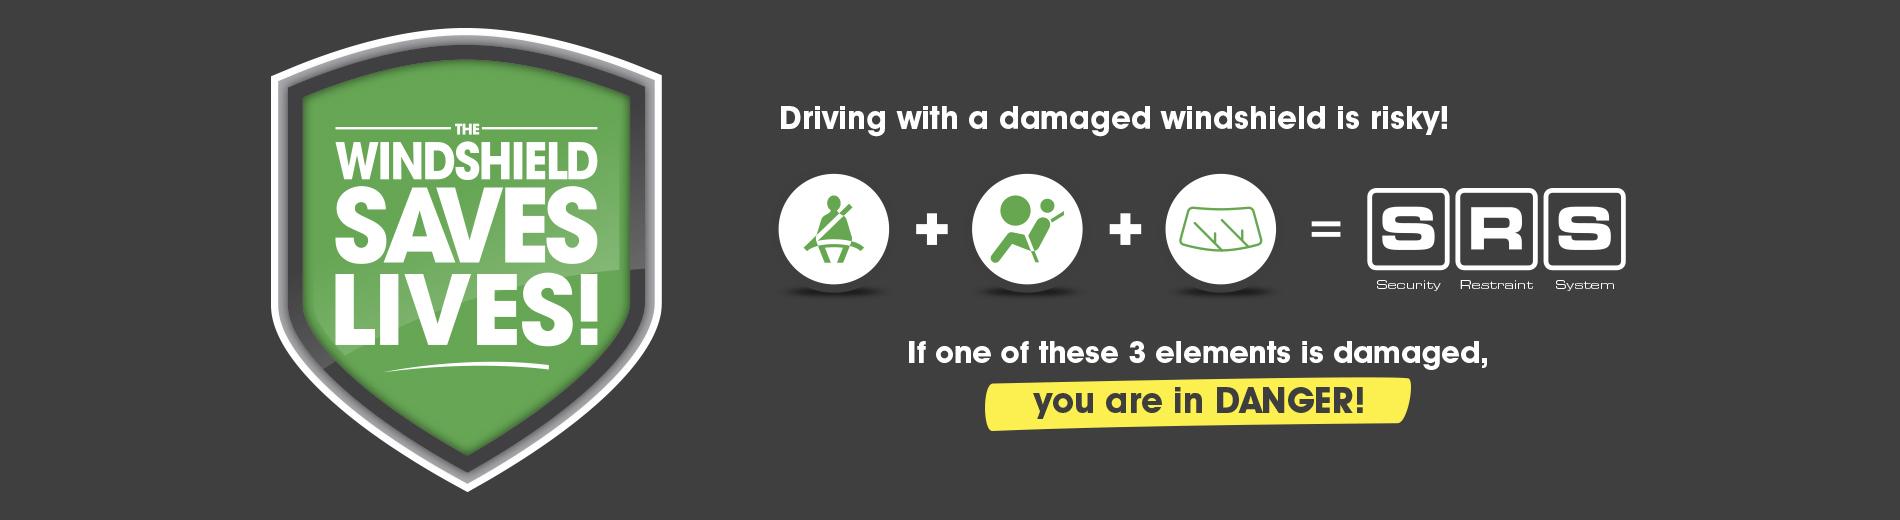 Windshield save lives